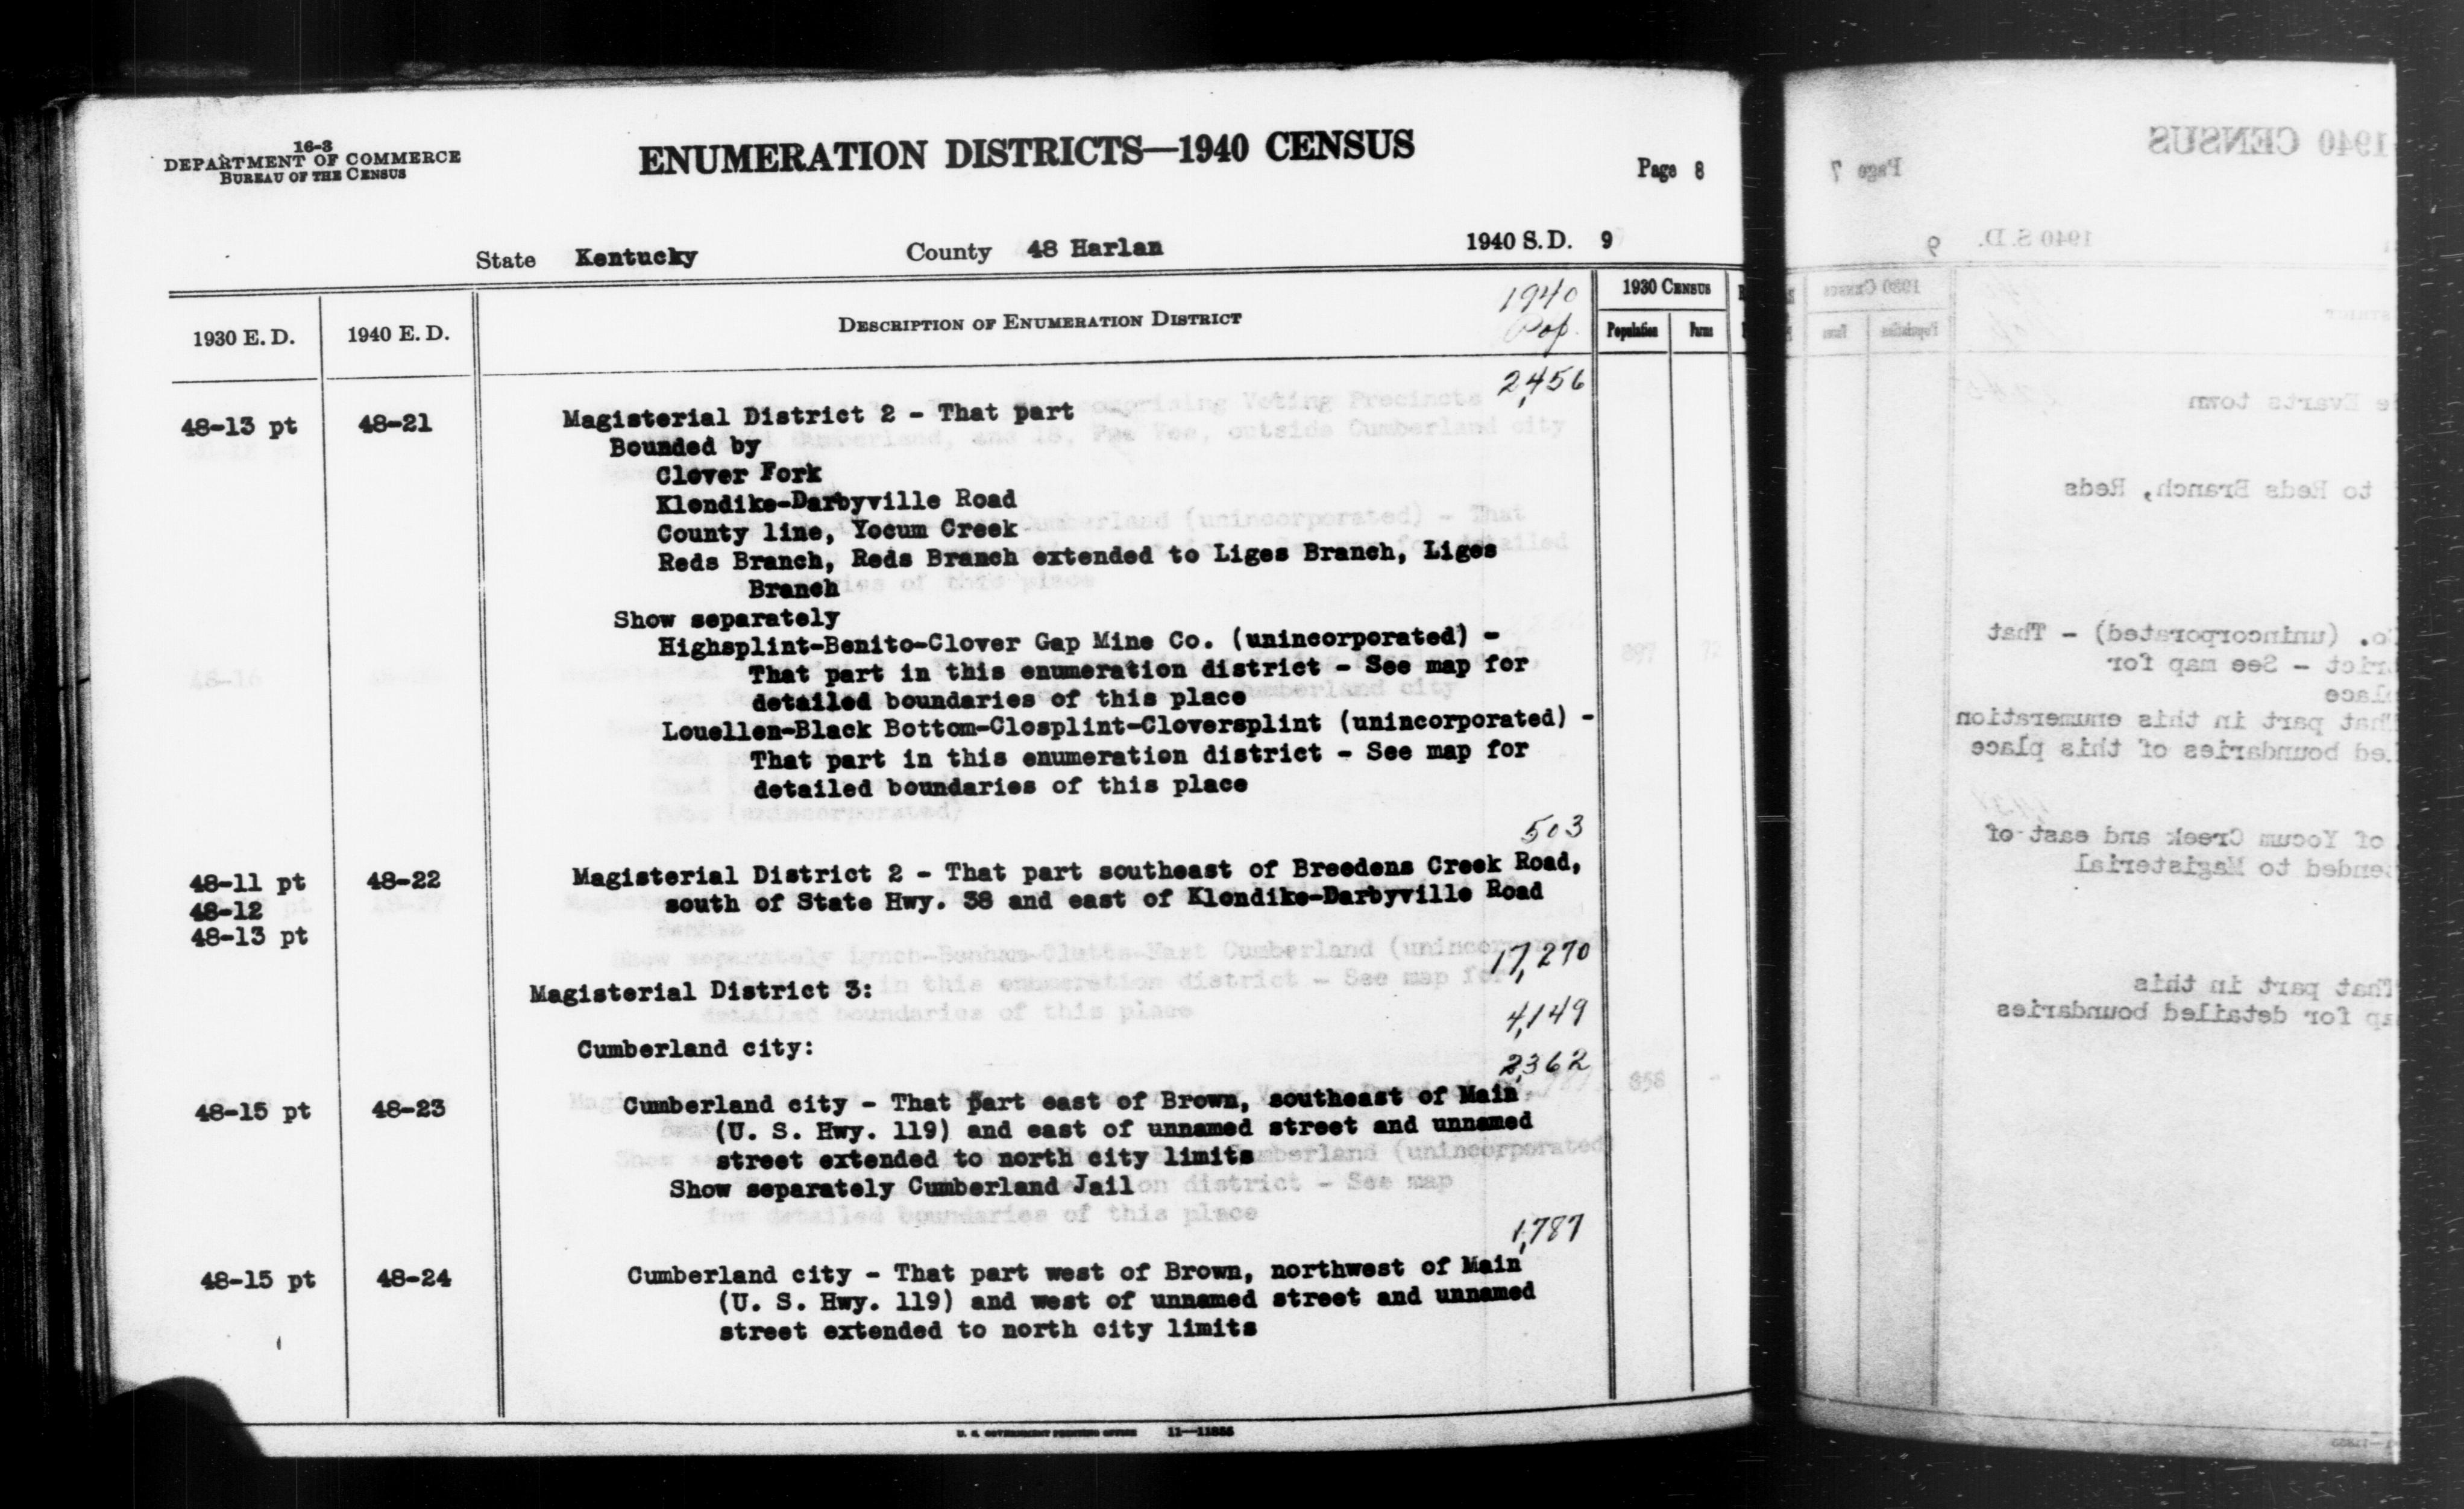 1940 Census Enumeration District Descriptions - Kentucky - Harlan County - ED 48-21, ED 48-22, ED 48-23, ED 48-24